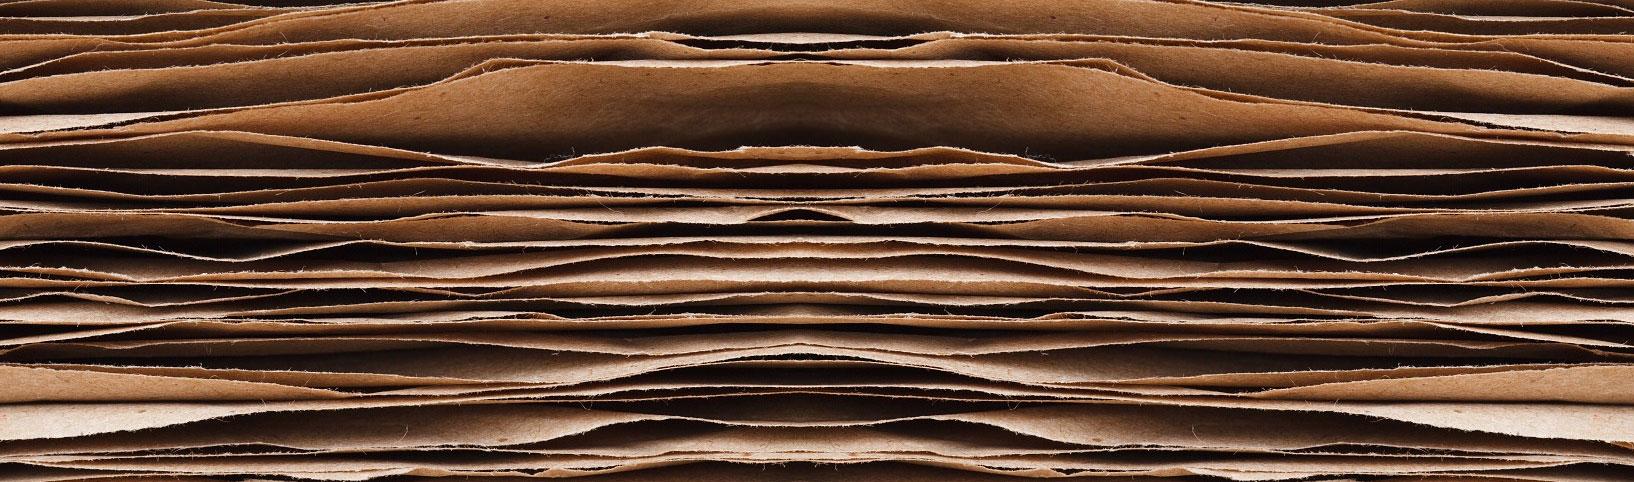 cardboard_slider